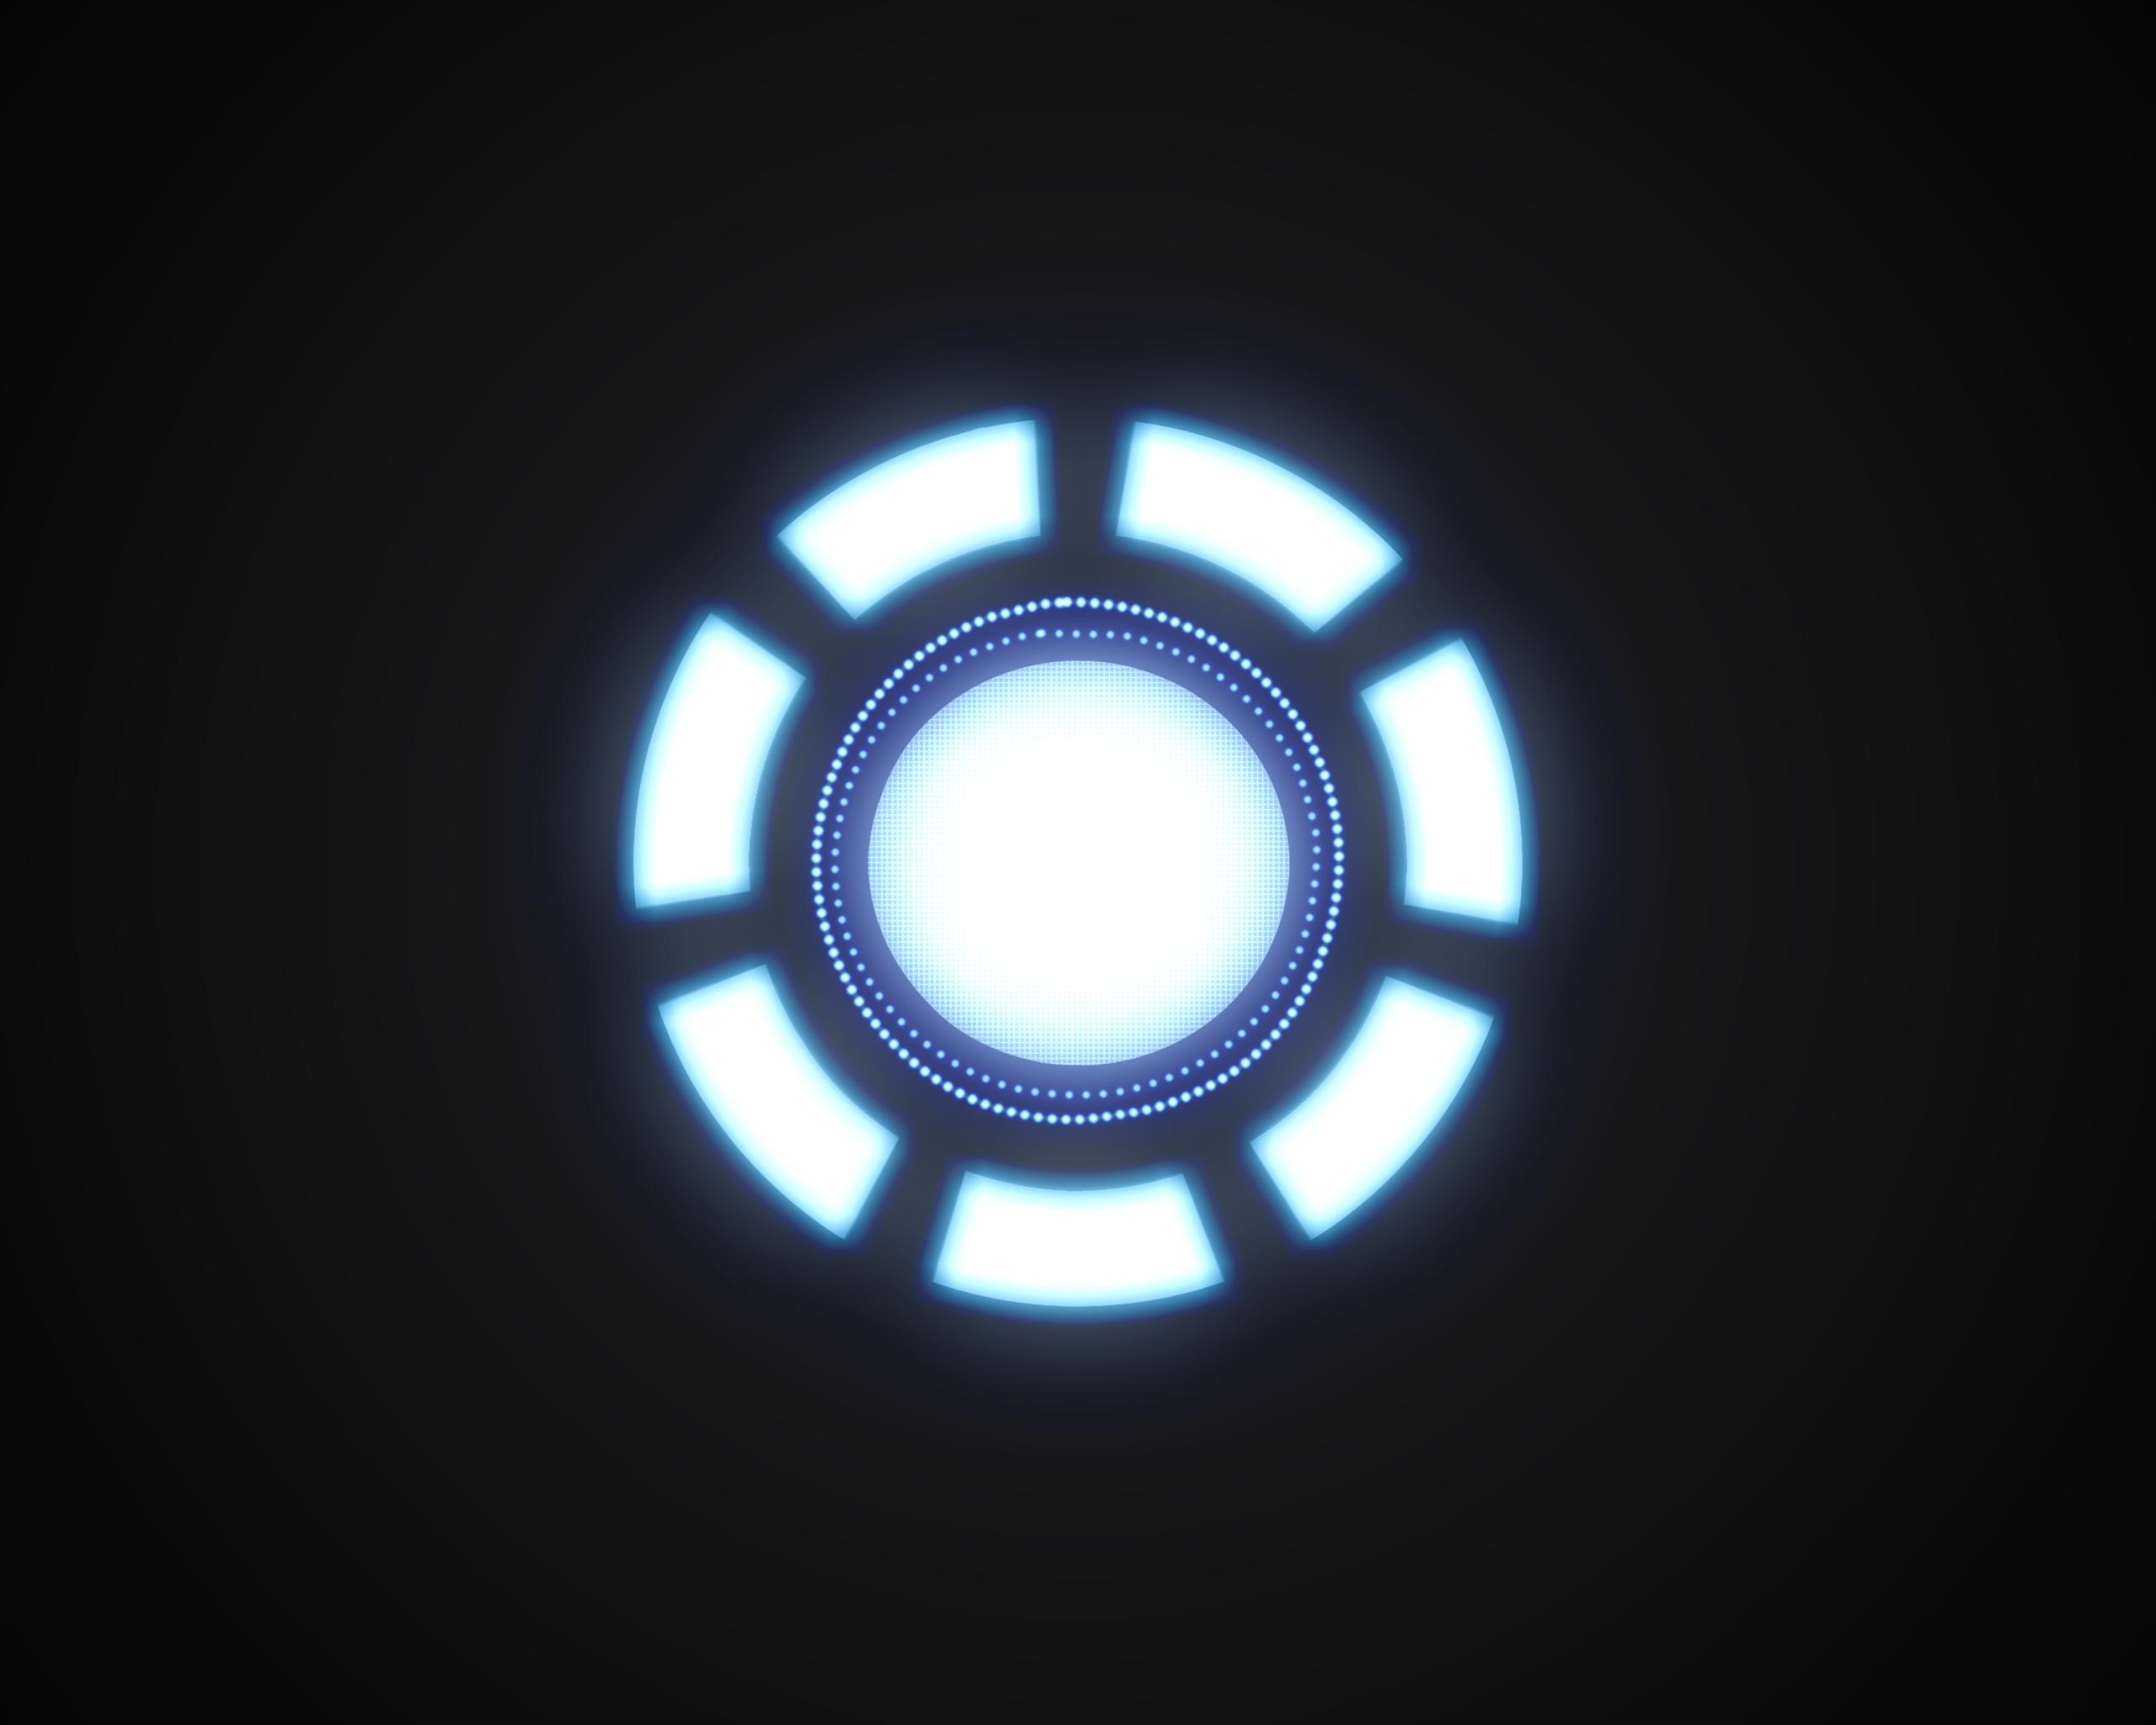 ironman arc reactor wallpaper hd Go Blackhawks Logo Go Blackhawks Logo